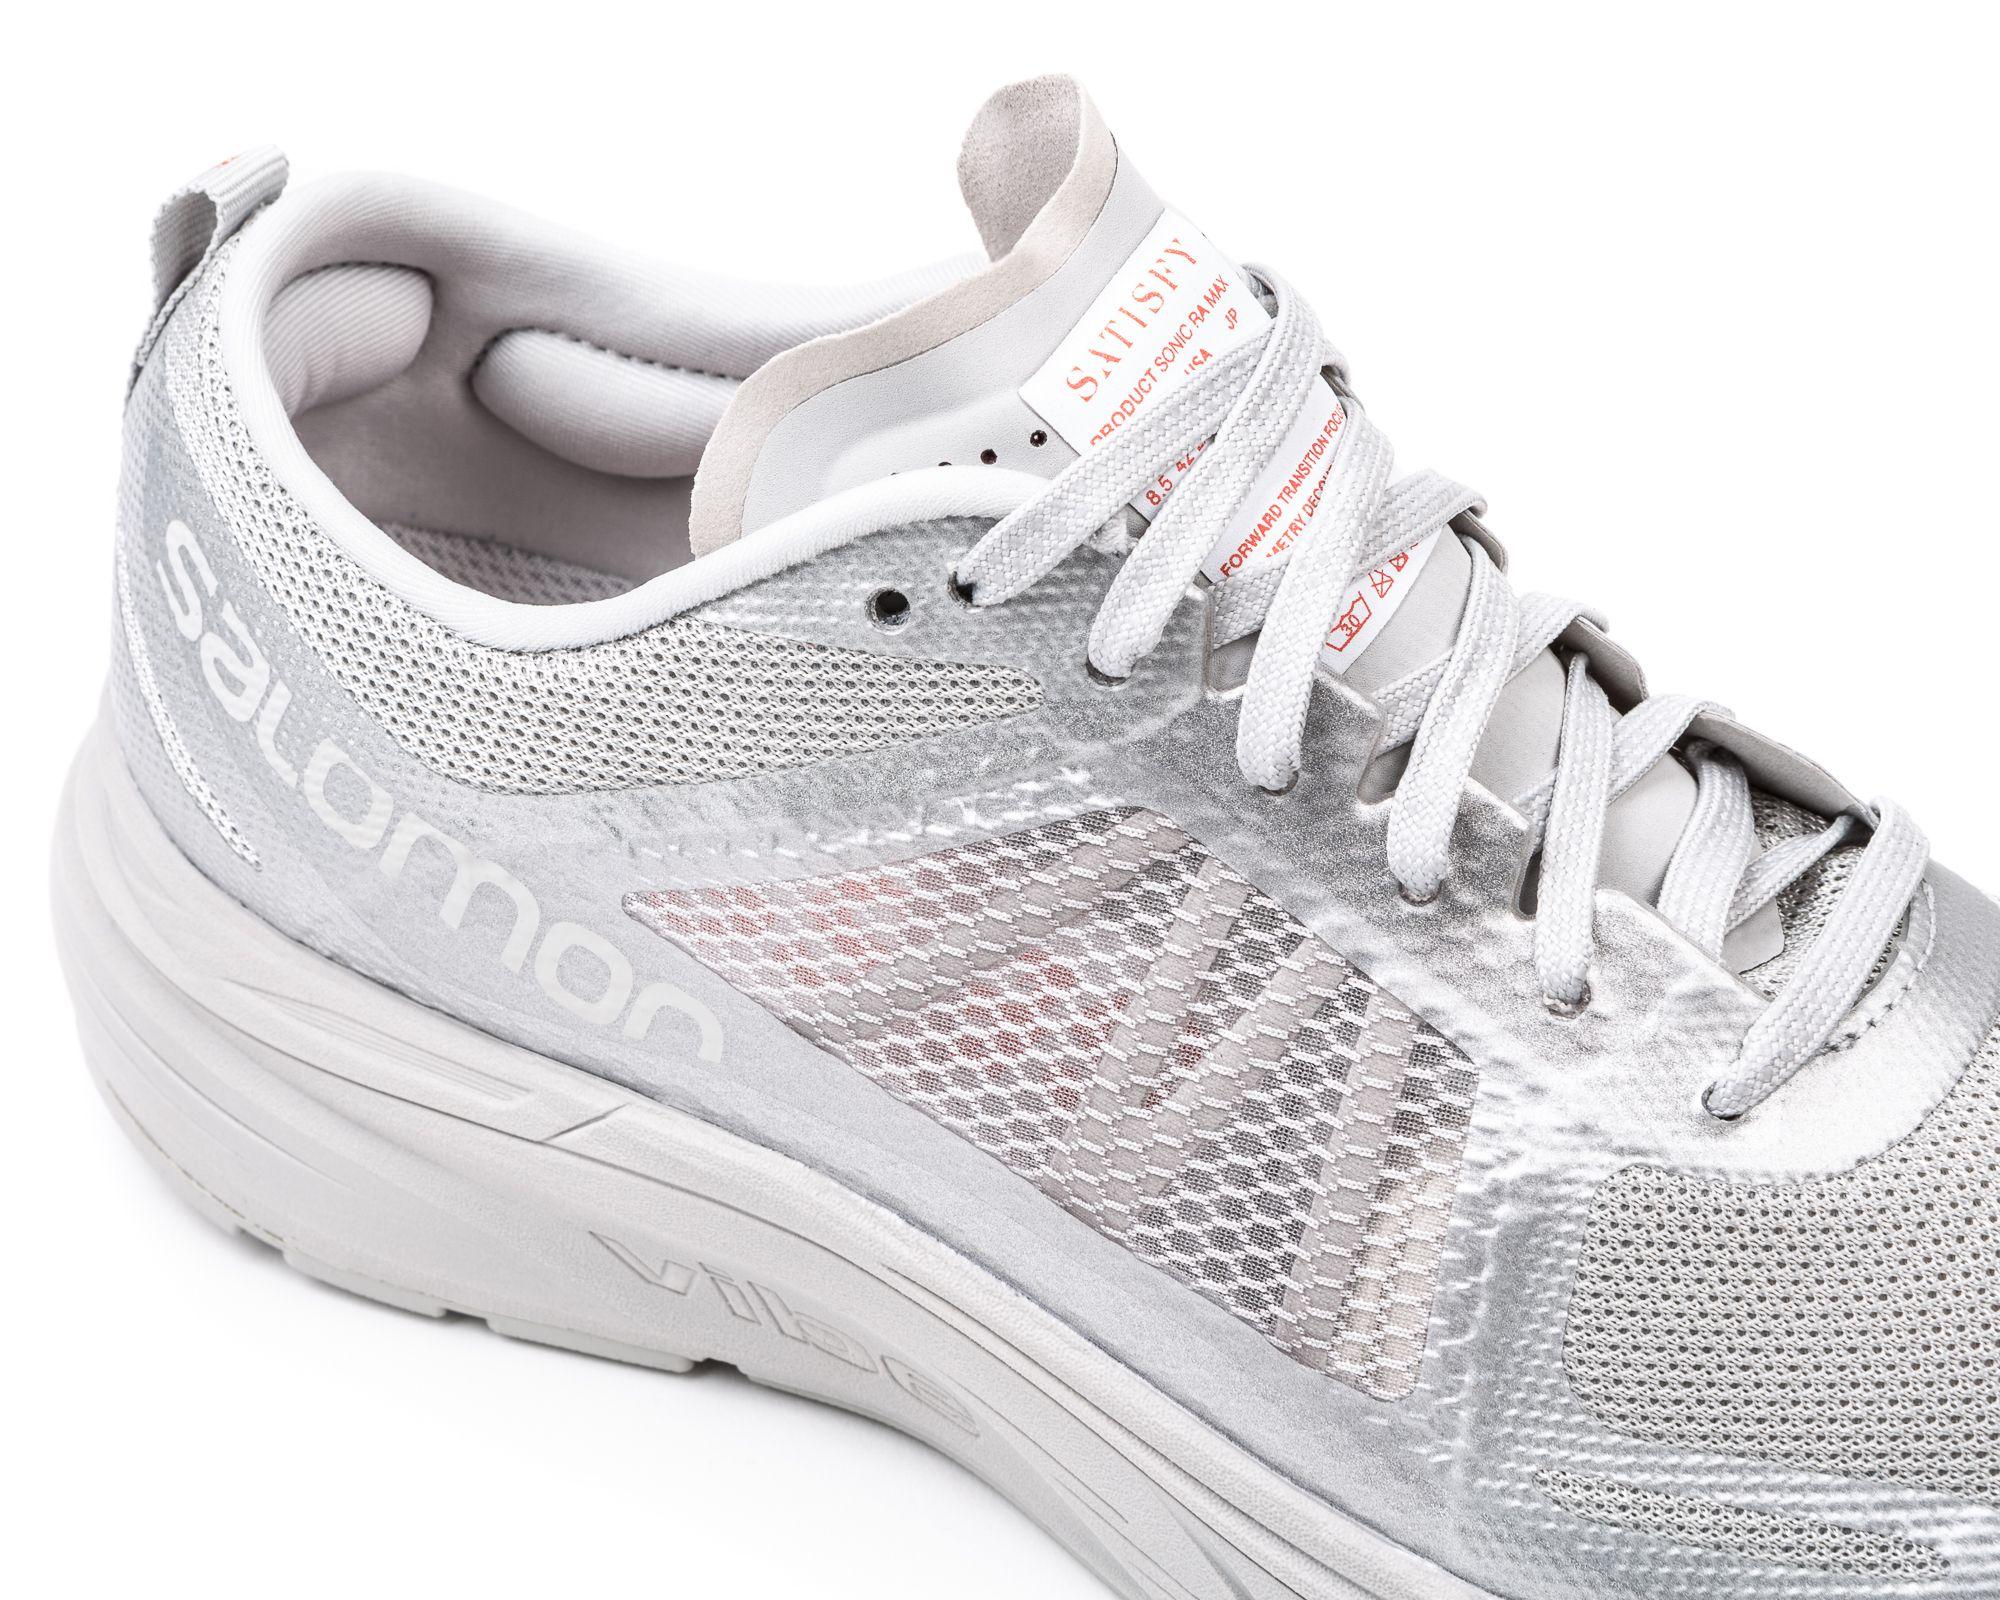 Satisfy X Salomon RA Max | Sneaker Releases